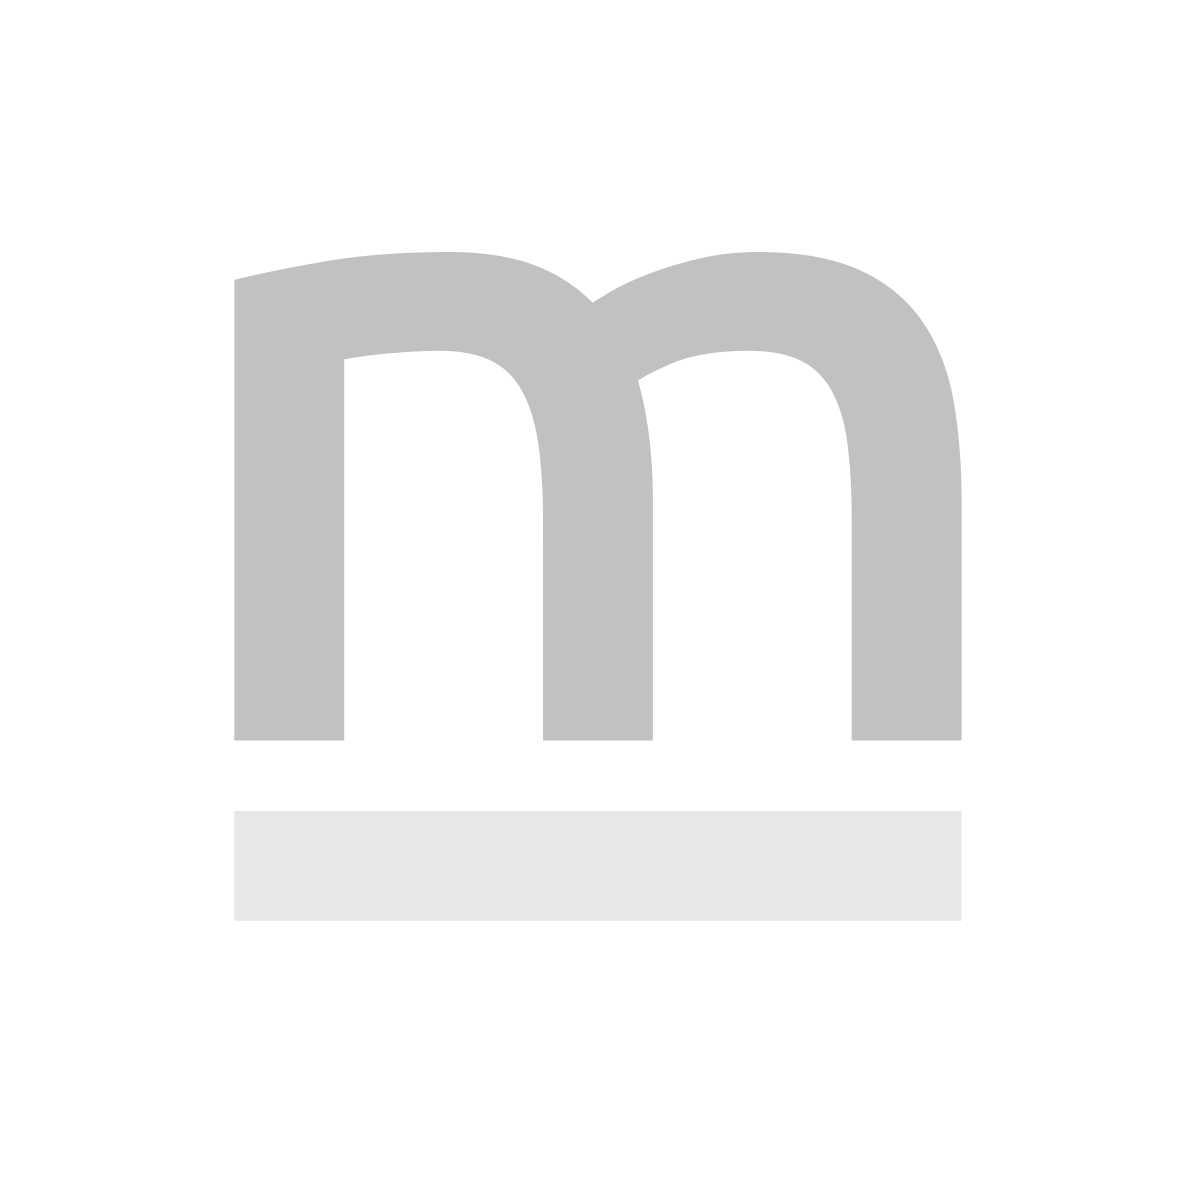 Pokrowiec na materac SPIN 180x200